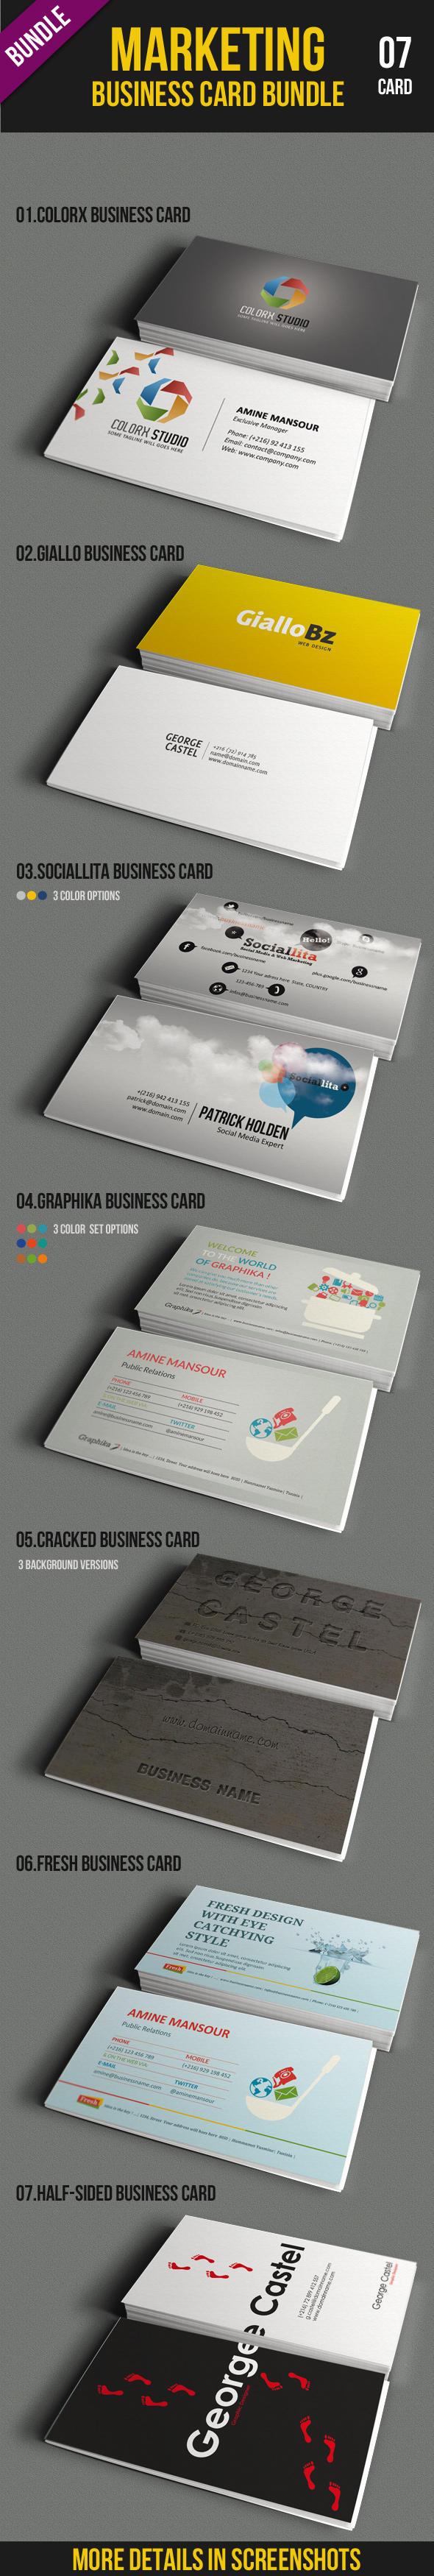 Marketing Business Card Bundle by kh2838